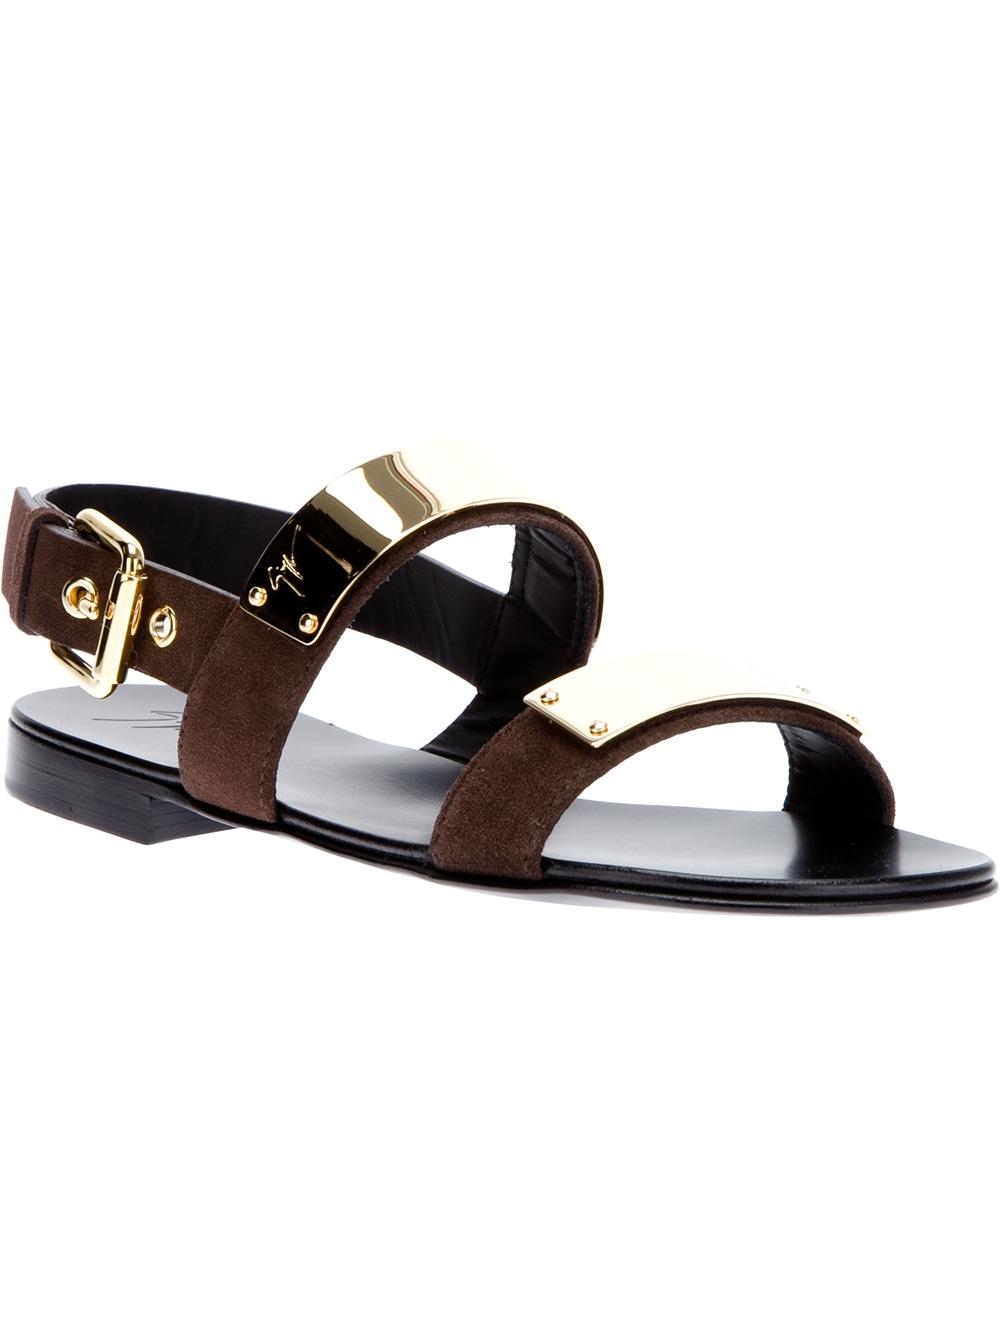 Zak braided-leather sandals Giuseppe Zanotti BkIIypAFp